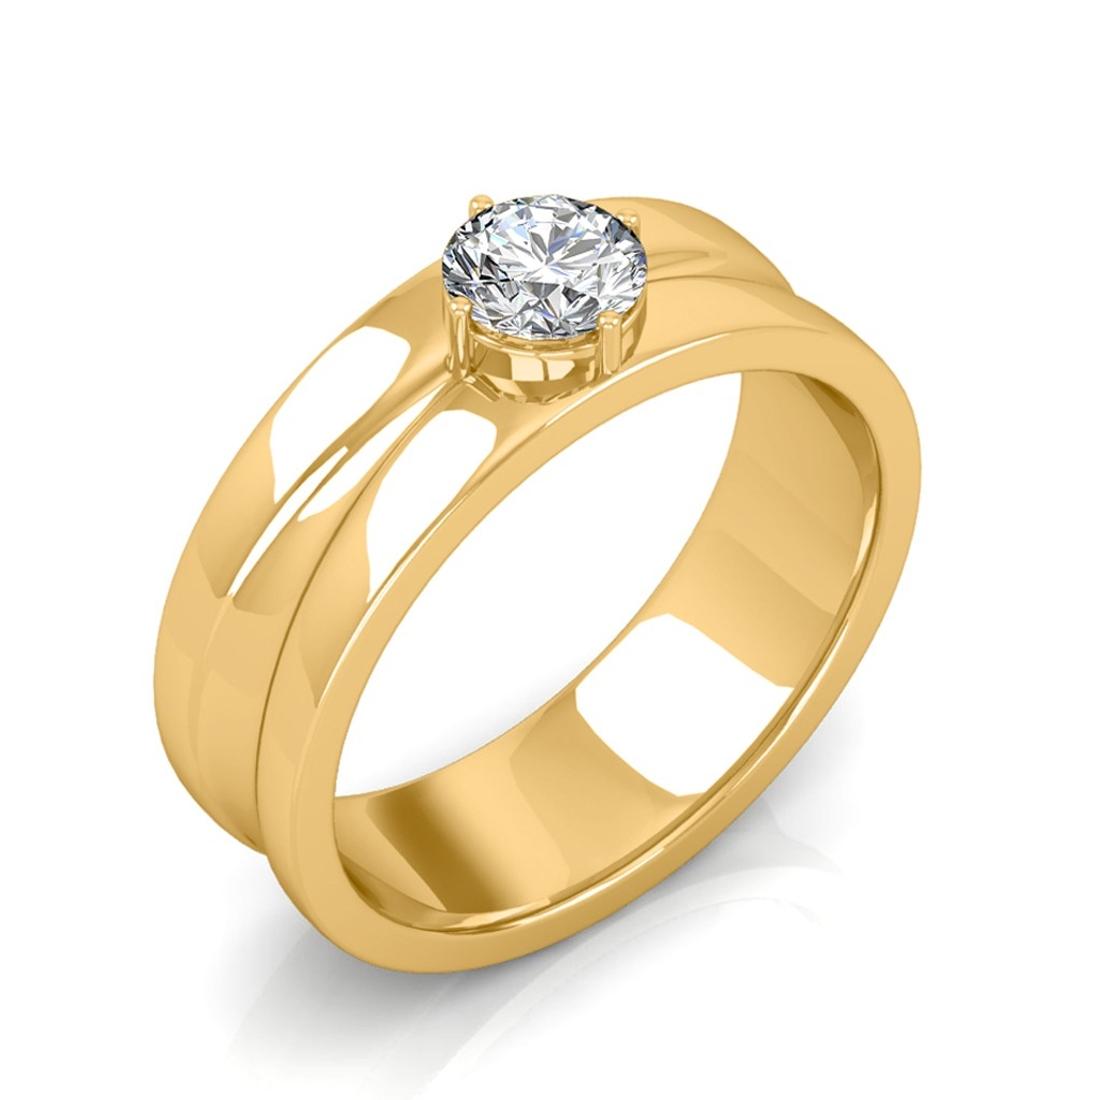 Sarvada Jewels' The Prius Ring For Him - Yellow - 0.50 carat